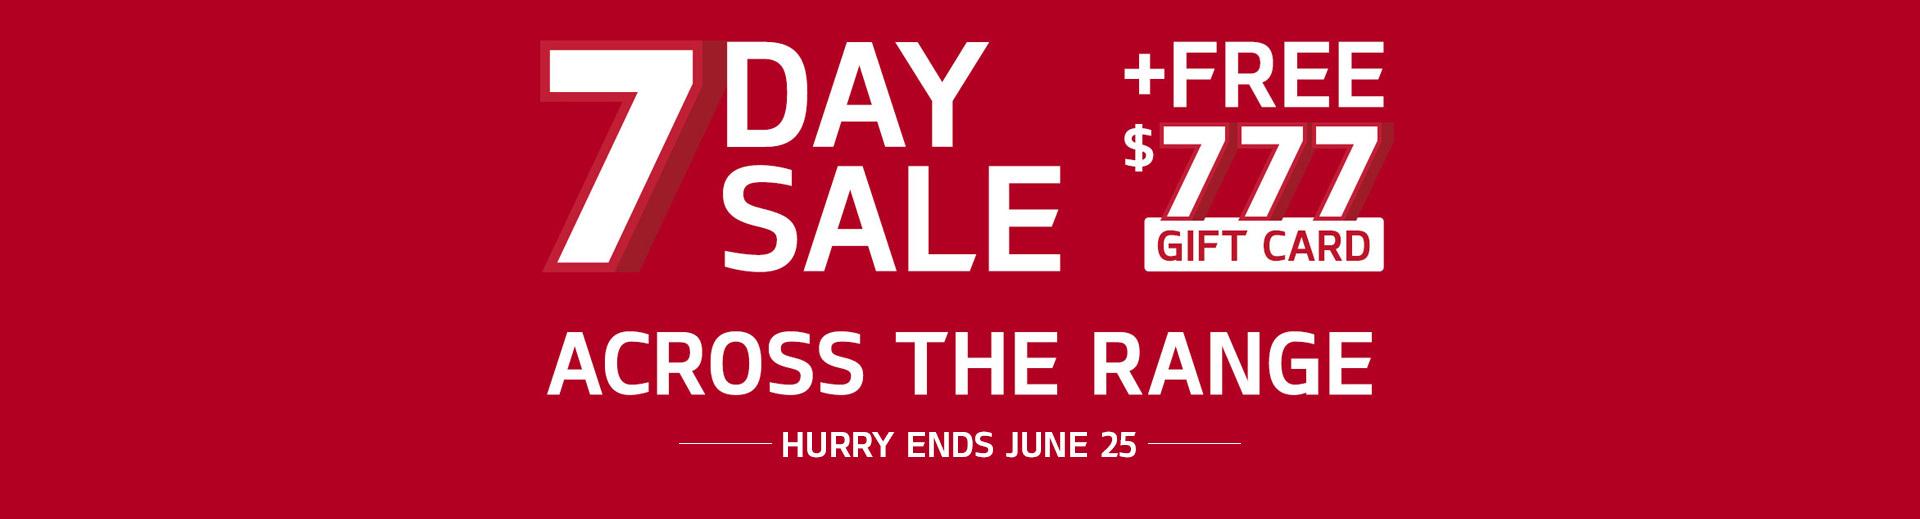 Kia's 7 Day Sale